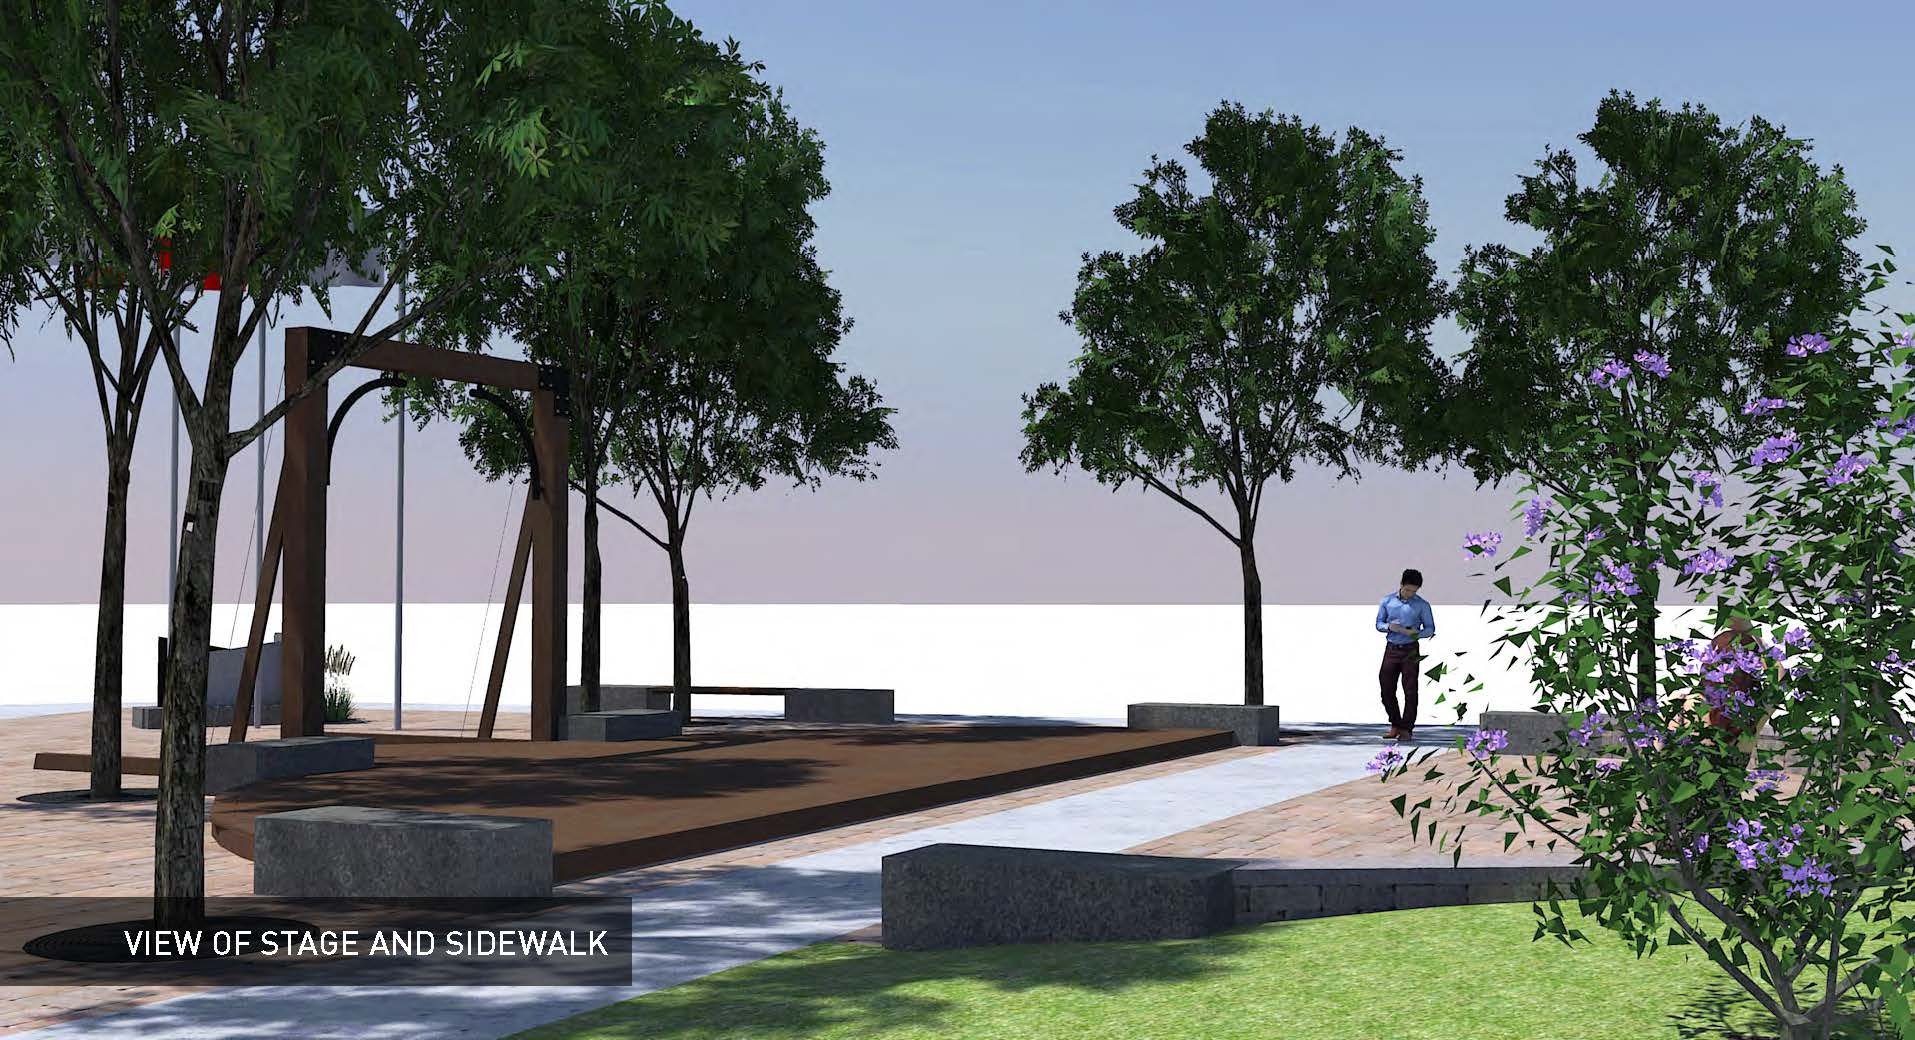 Riverview Design Solutions_Stage Area_Walkway_Community Park Concept_Landscape Design_Architecture.jpg